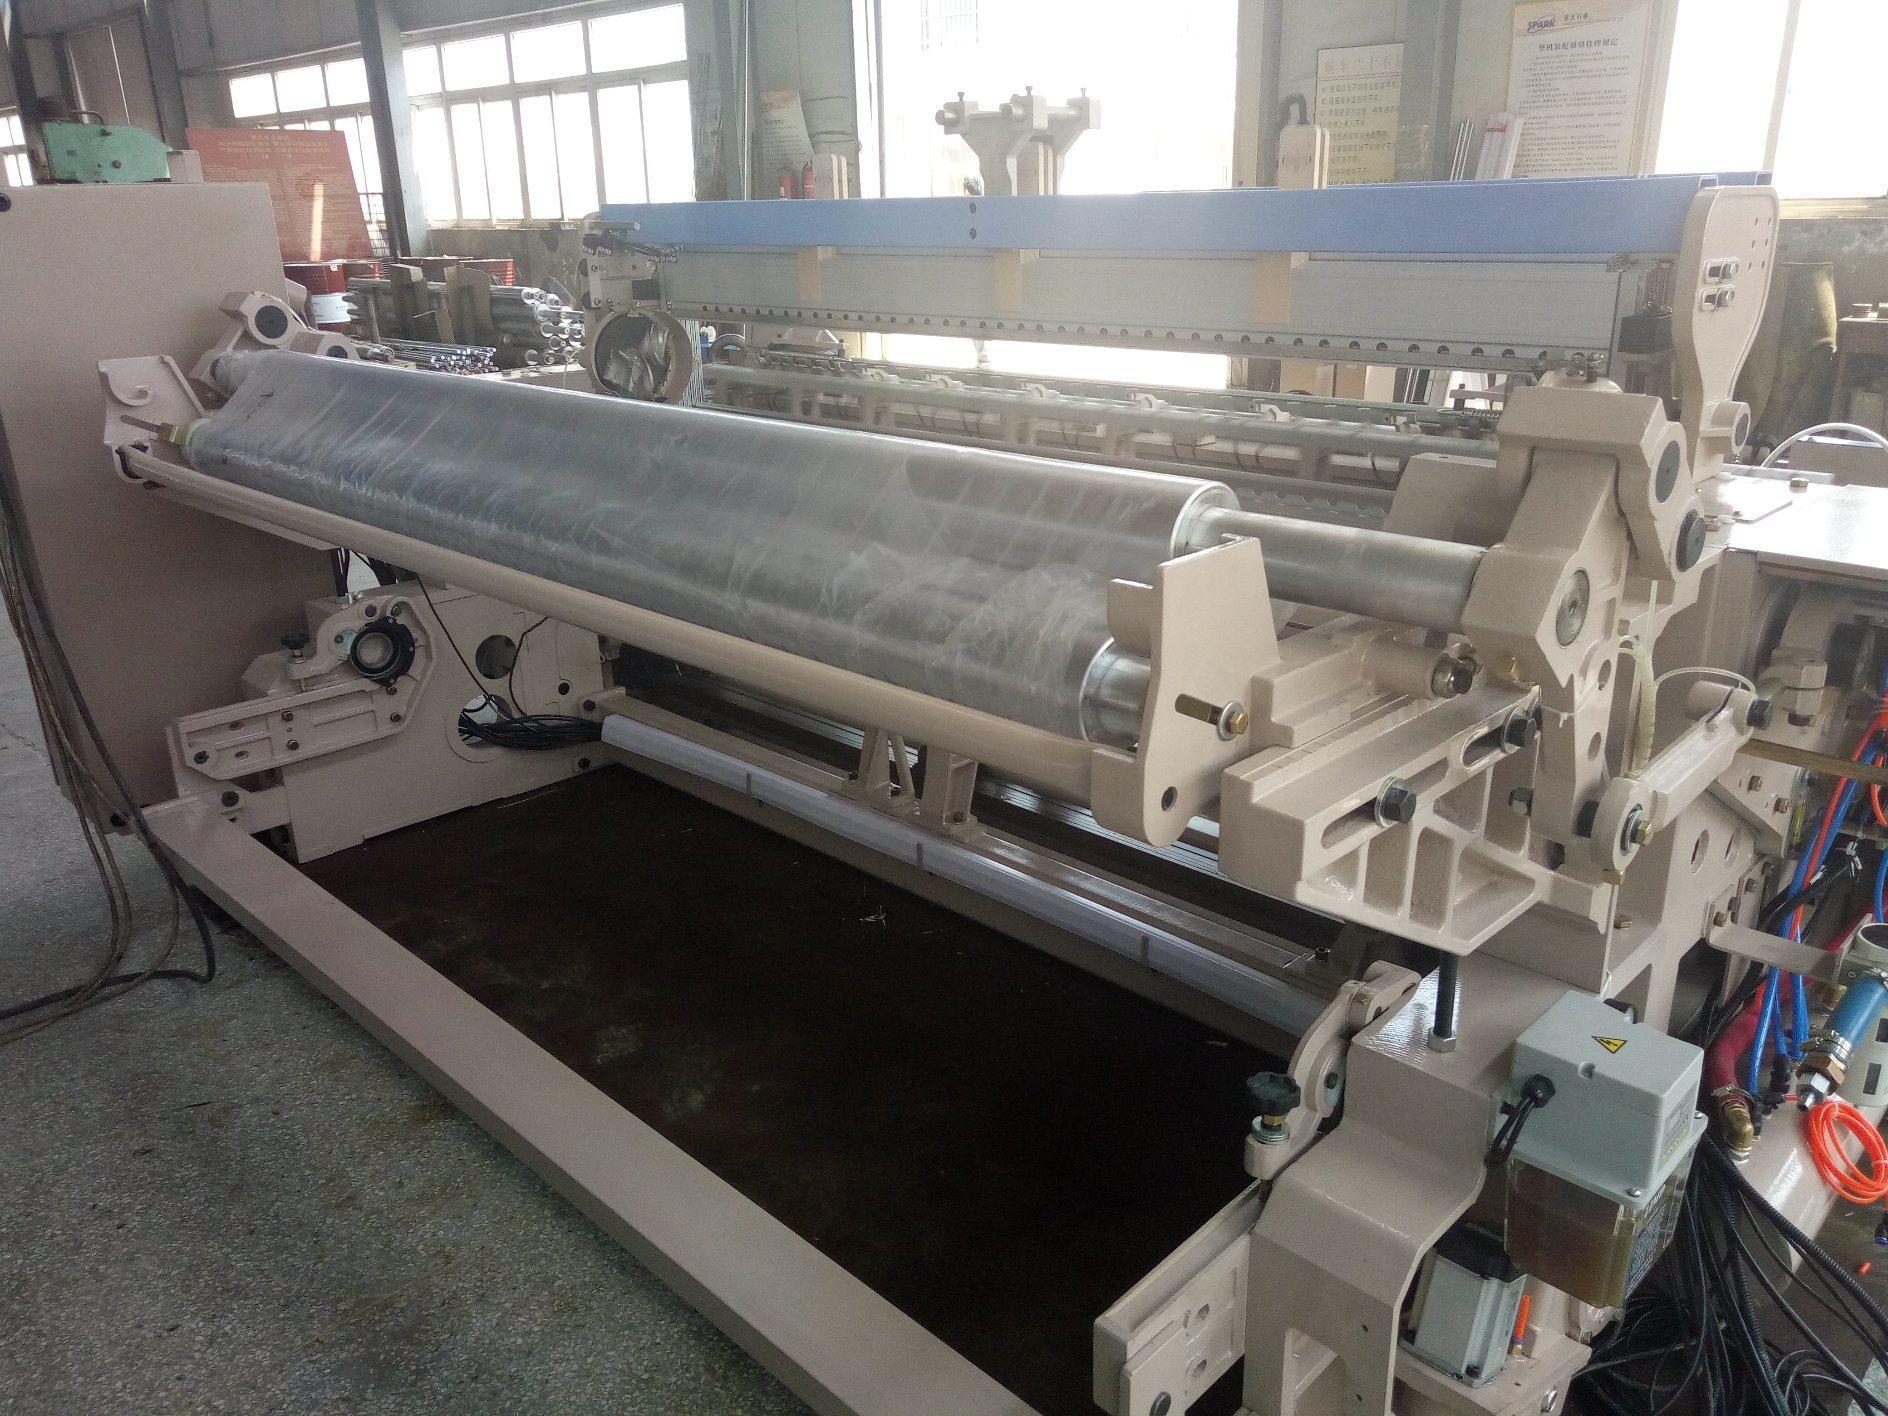 High Speed Air Jet Power Loom Weaving Machinery